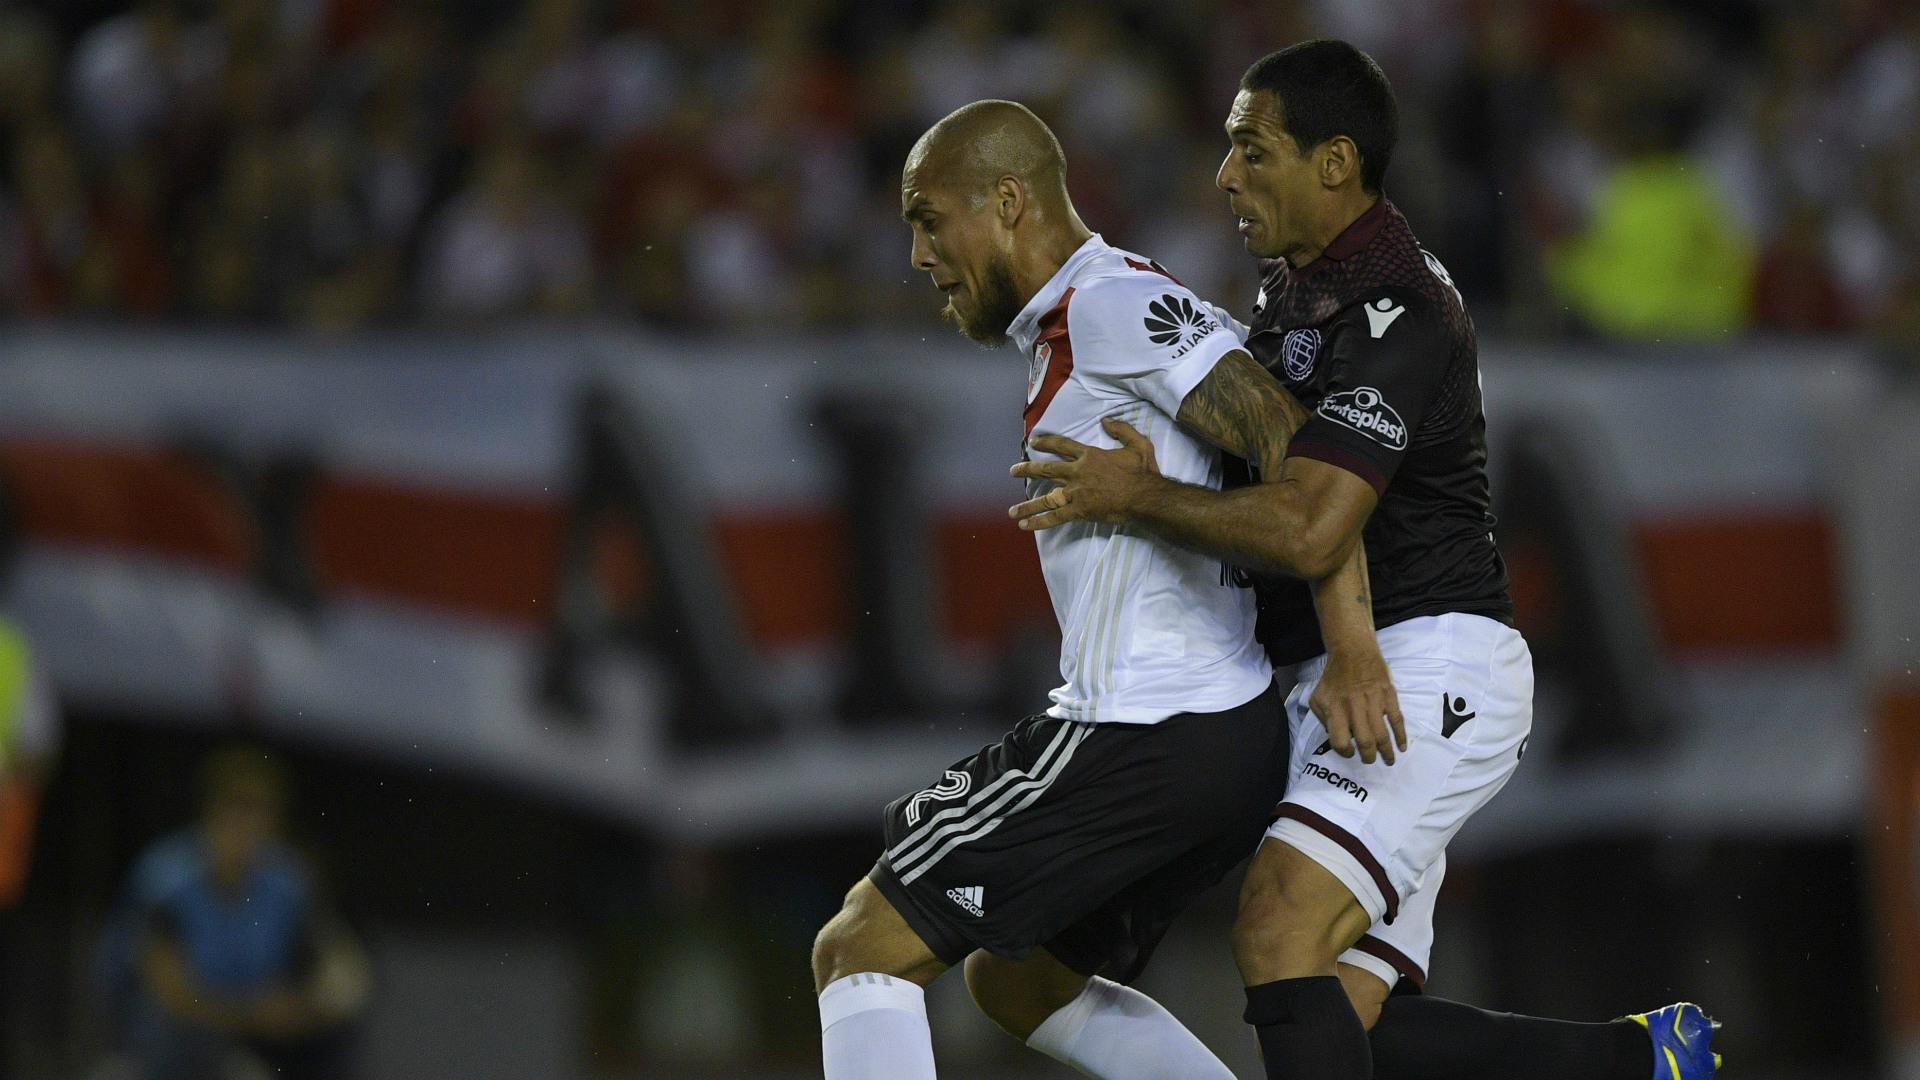 Sand Maidana Lanus River Semifinal Copa Libertadores 31102017